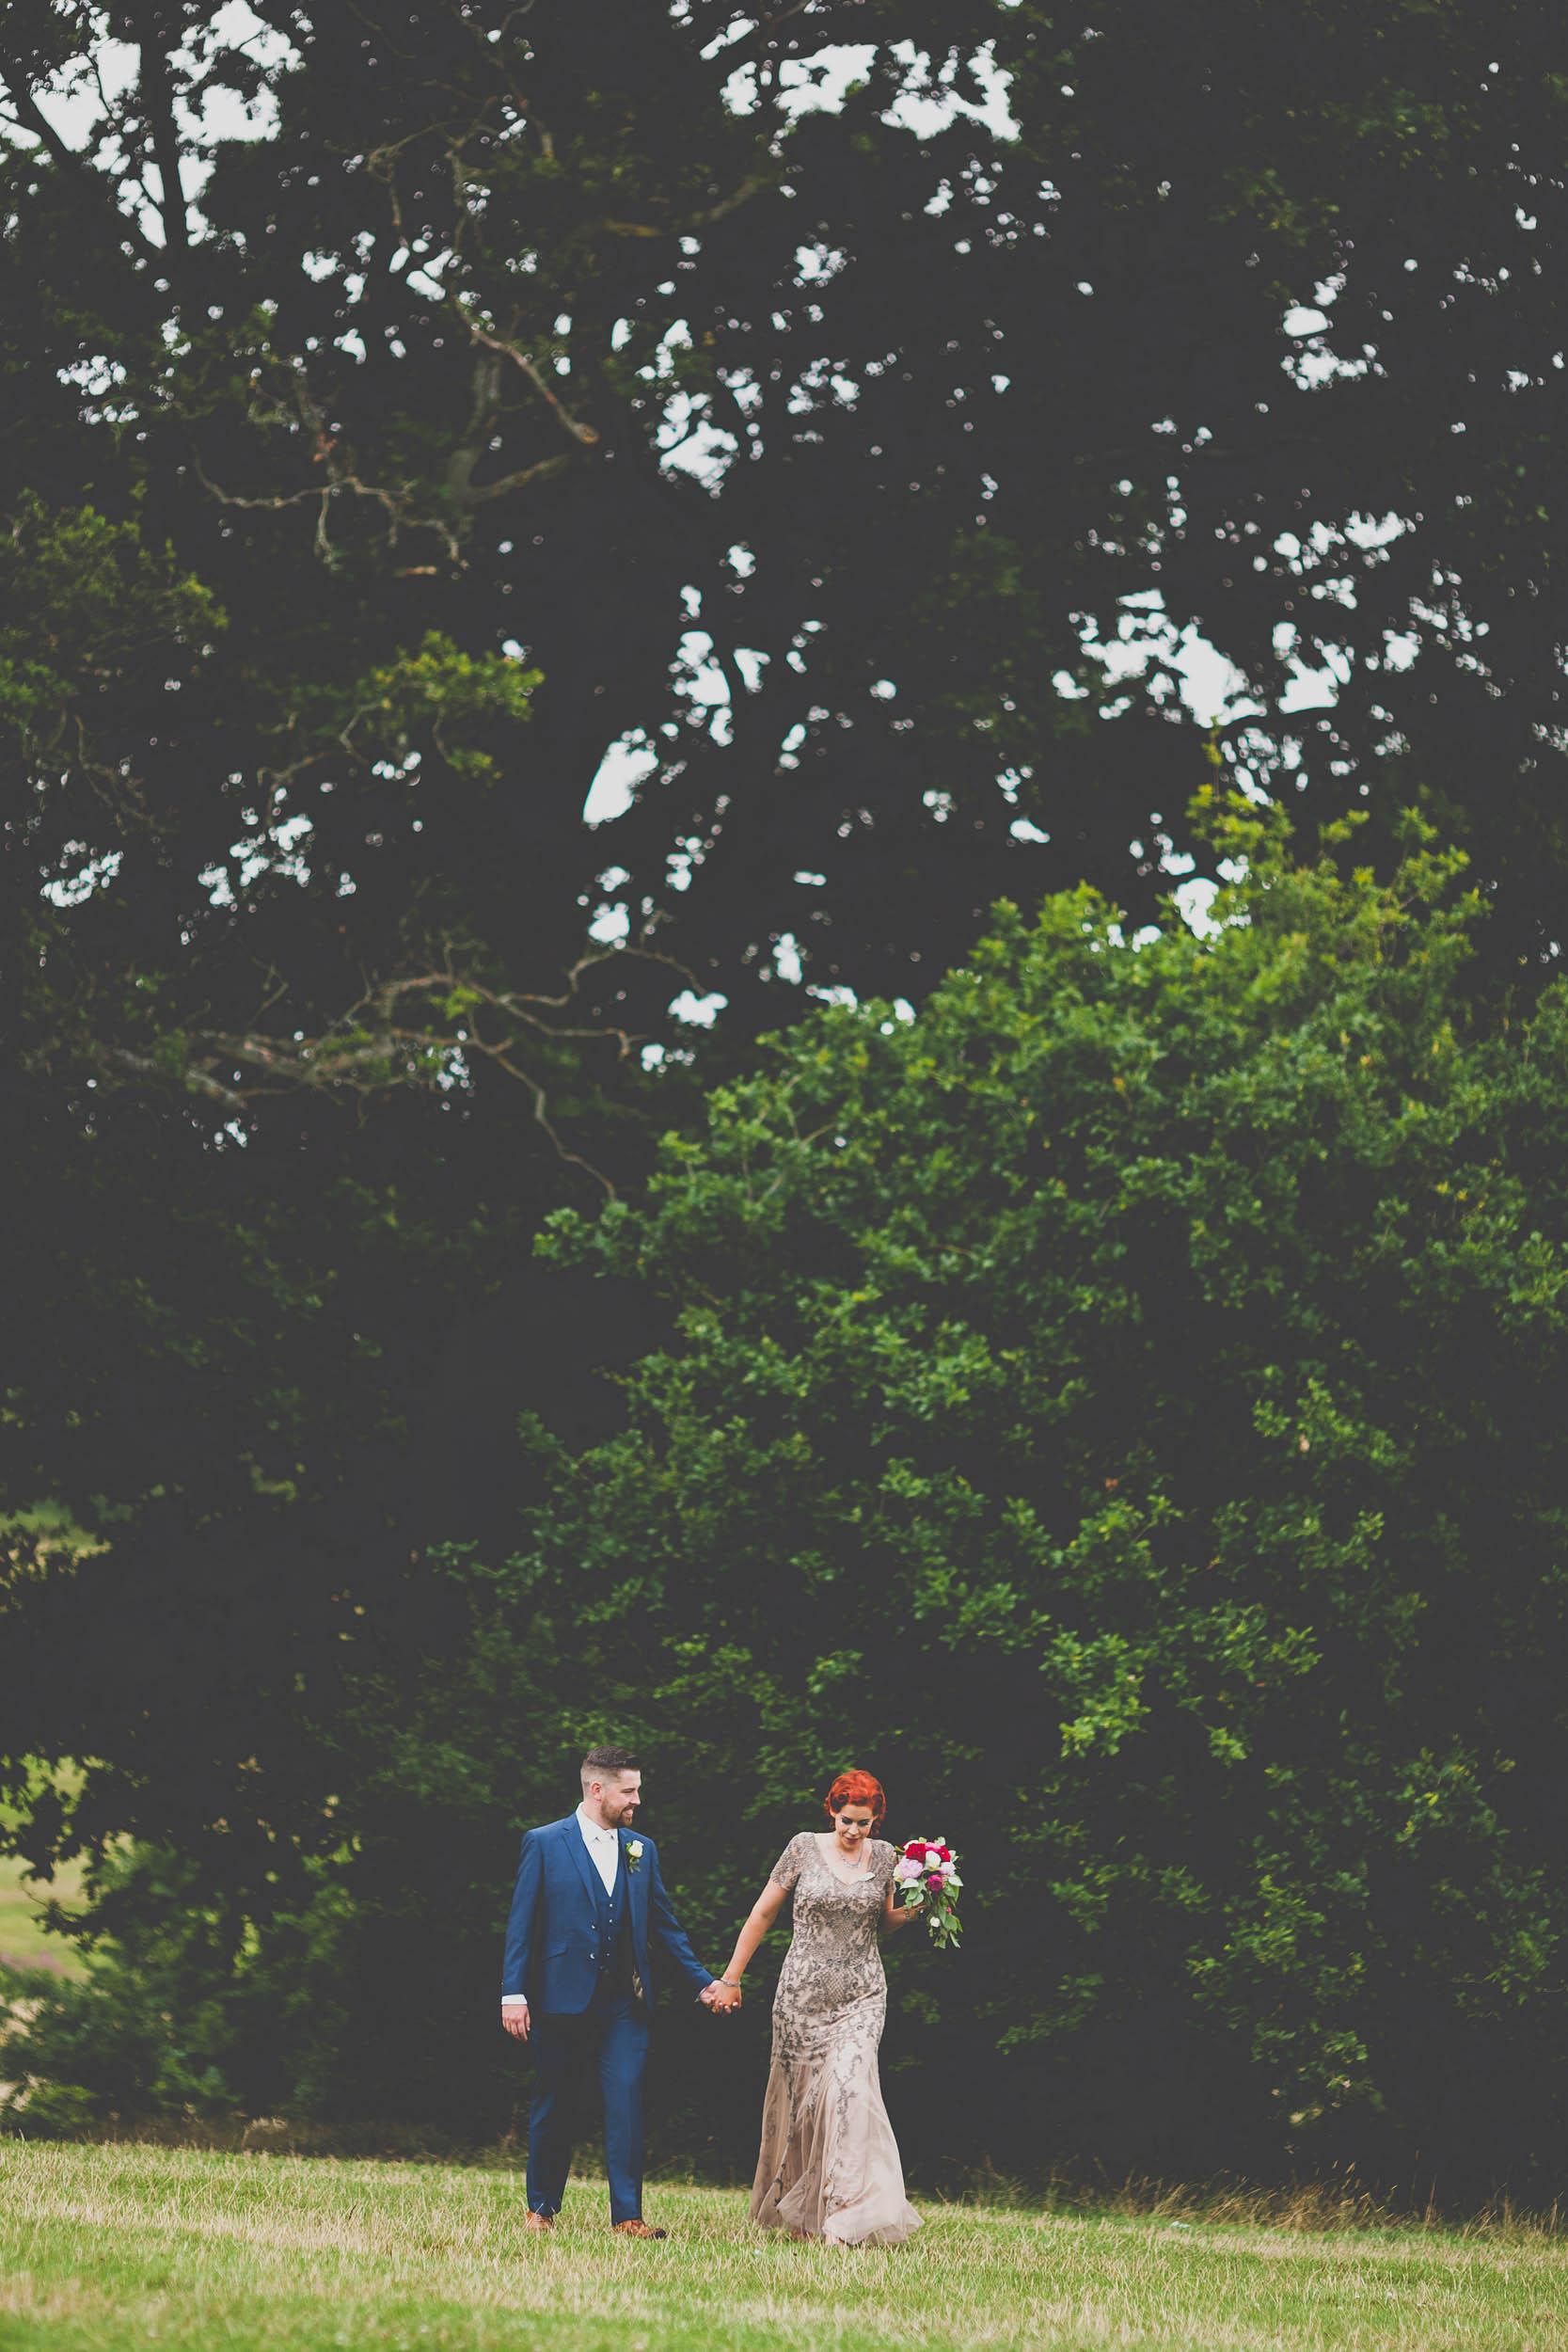 queen-elizabeths-hunting-lodge-epping-forest-wedding195.jpg